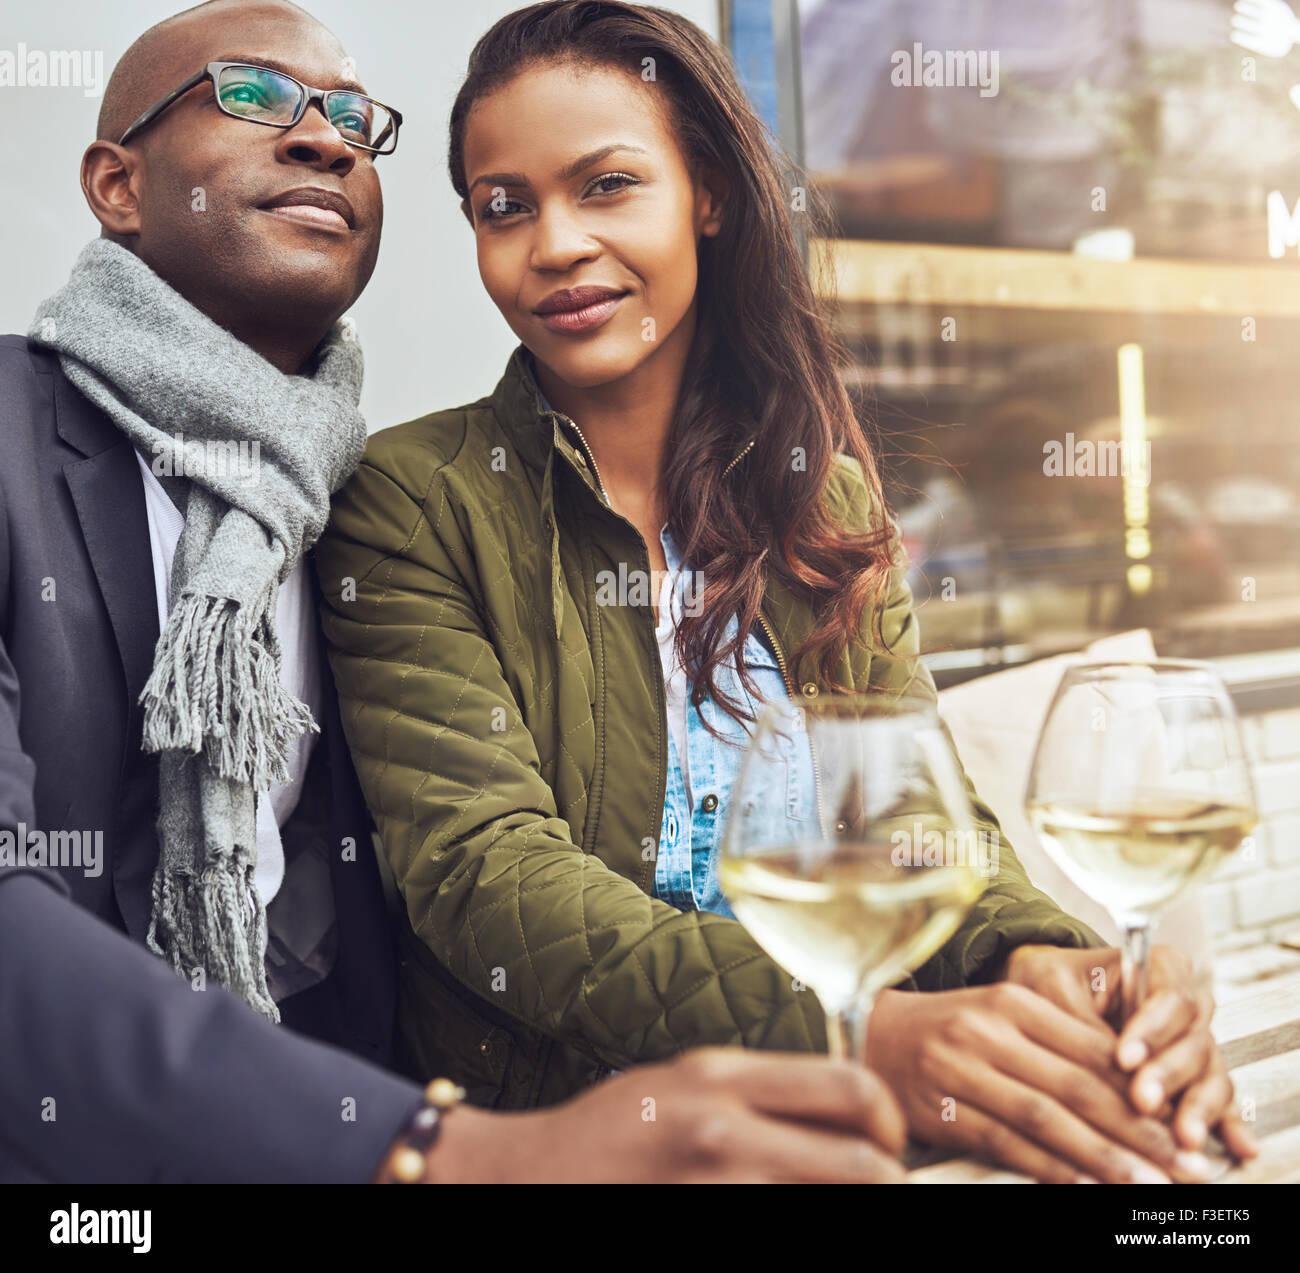 Afro-amerikanische Paar dating, Frau suchen gerade an der Kamera Stockbild